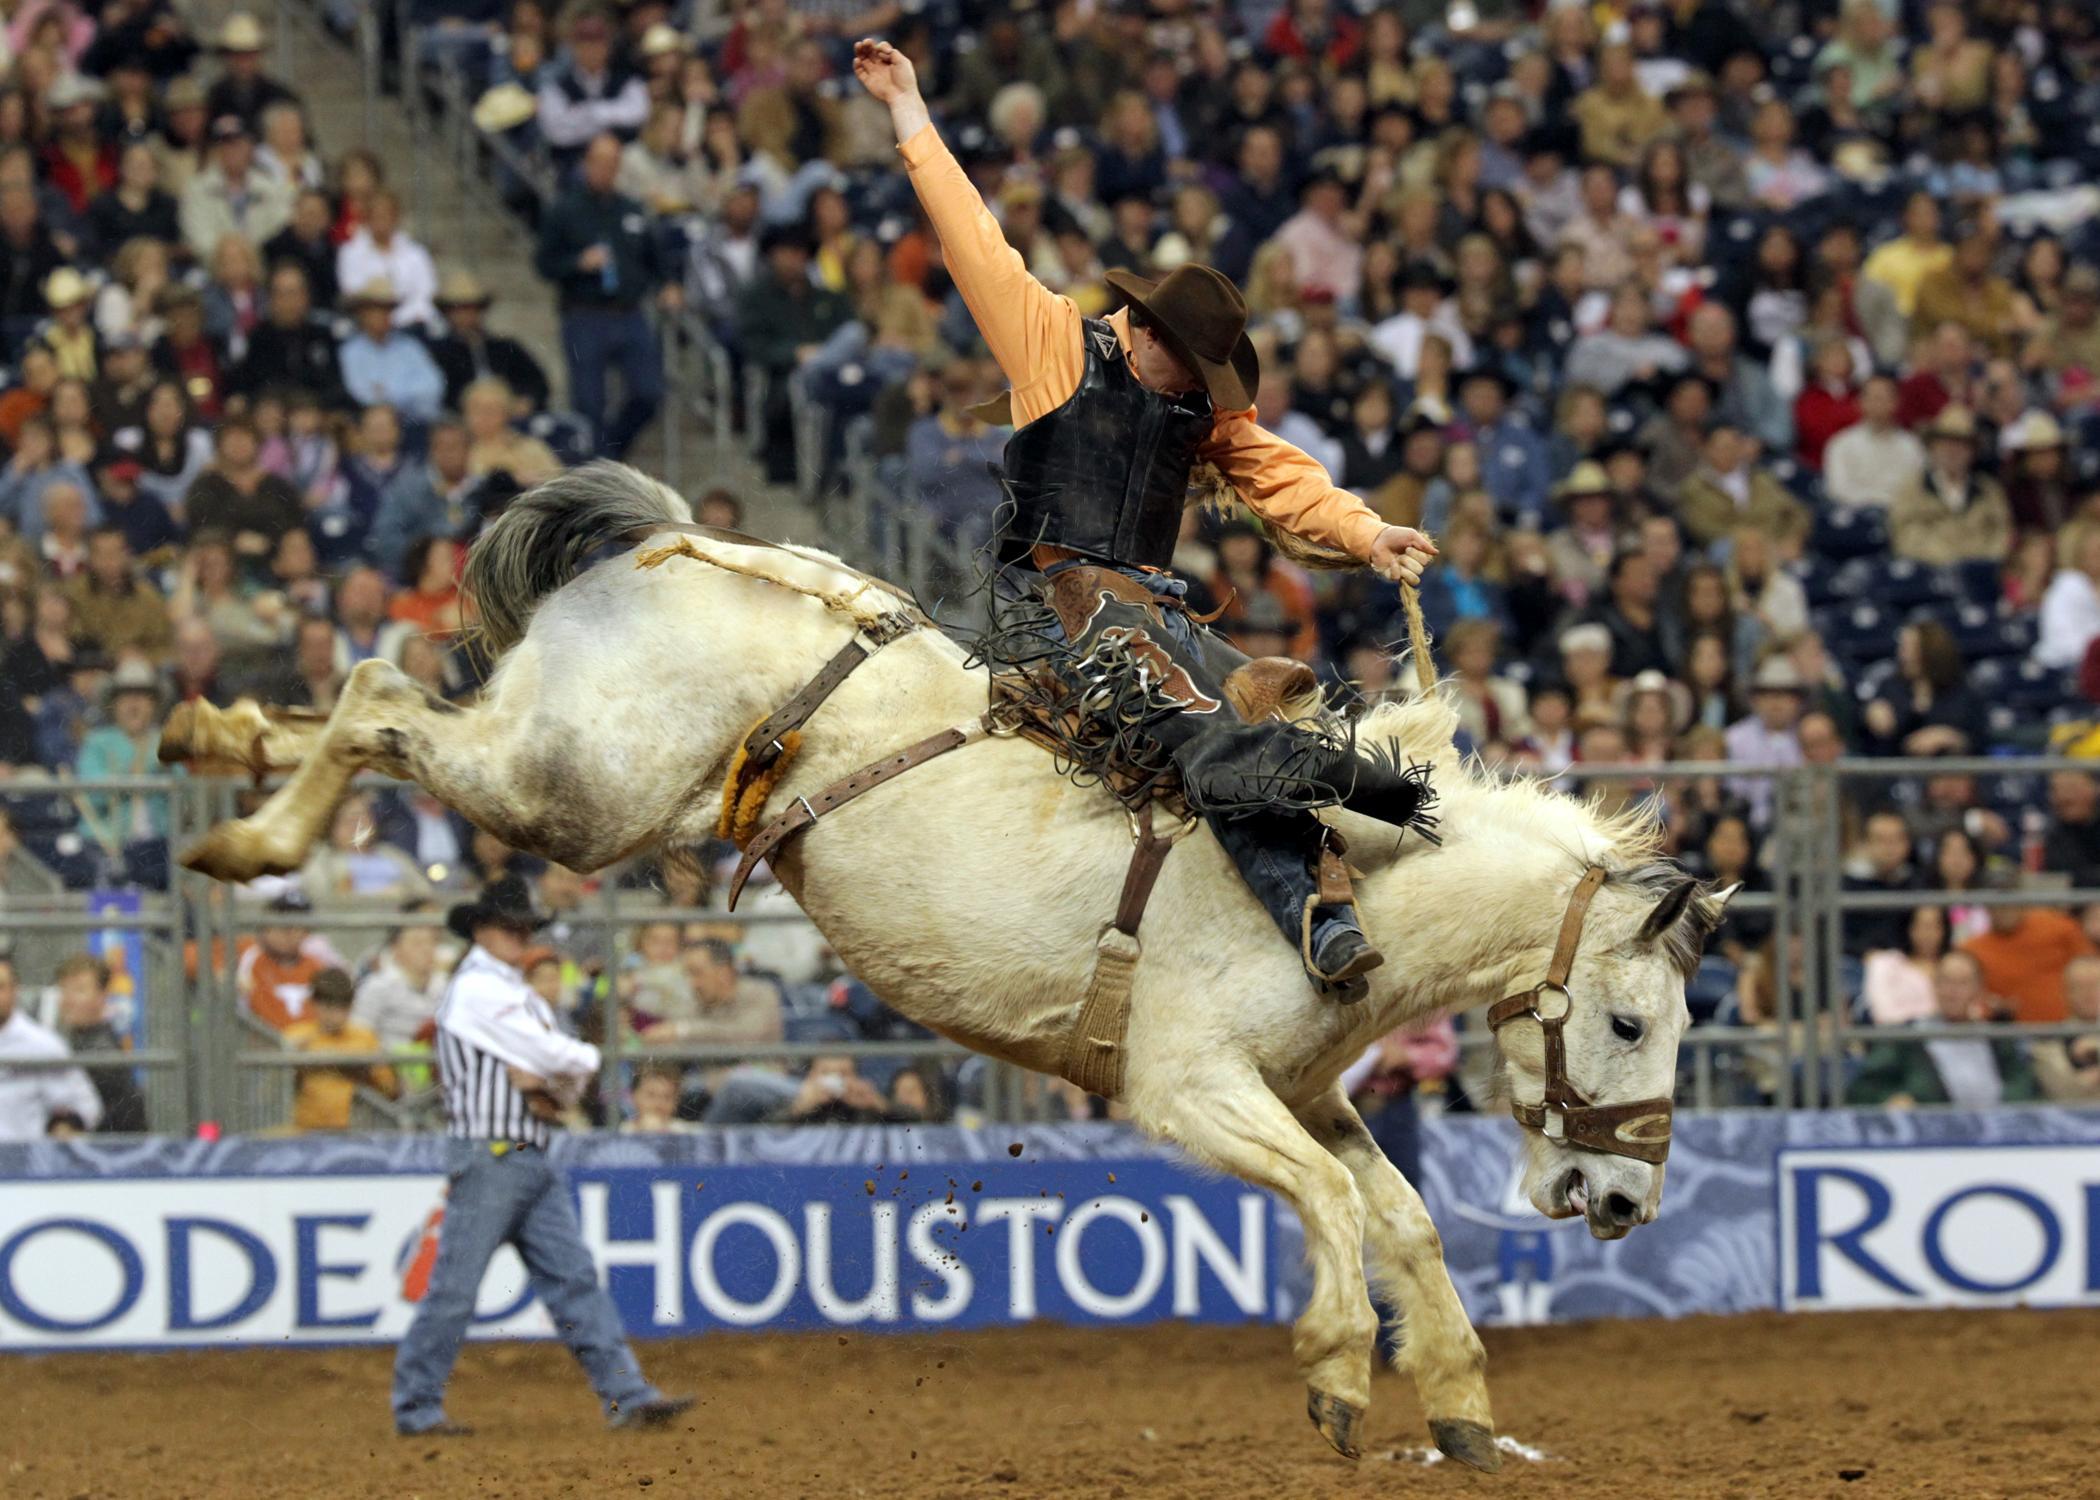 Top Events Houston Rodeo Adele Boston Celtics Justin Bieber Mumford amp Sons Boston Red Sox